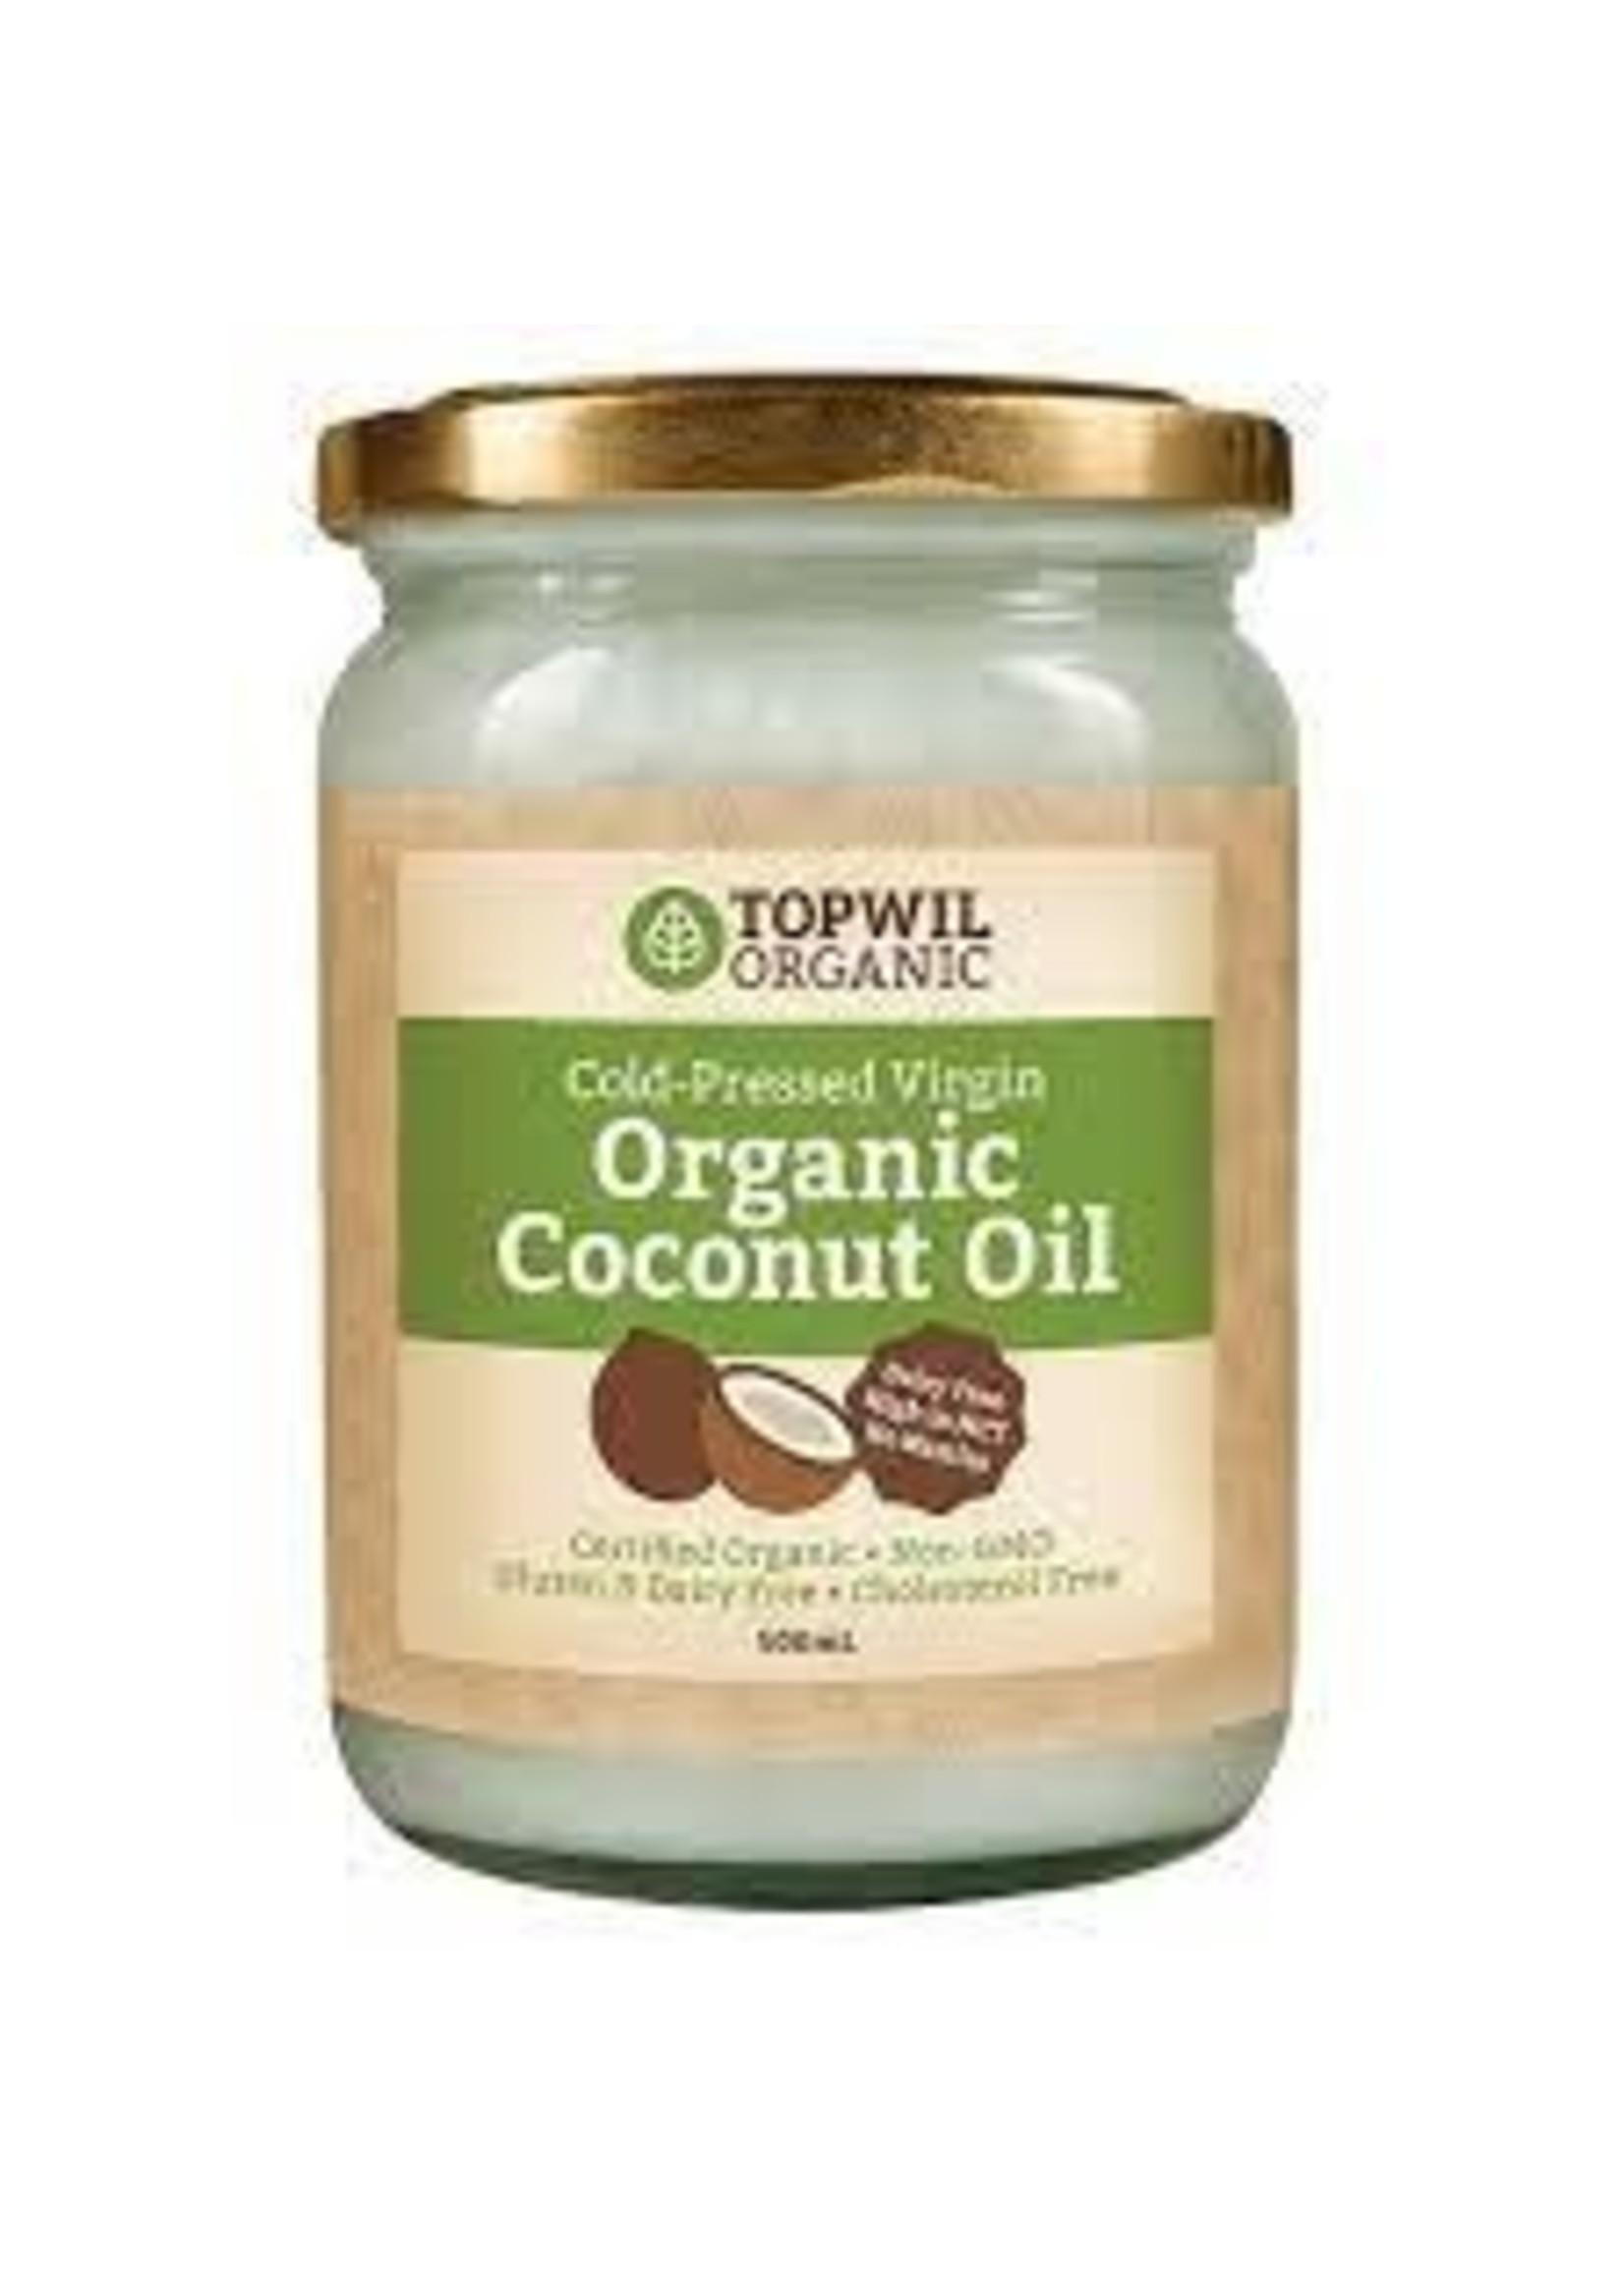 Topwil Topwil Organic Coconut oil cold pressed virgin 300g